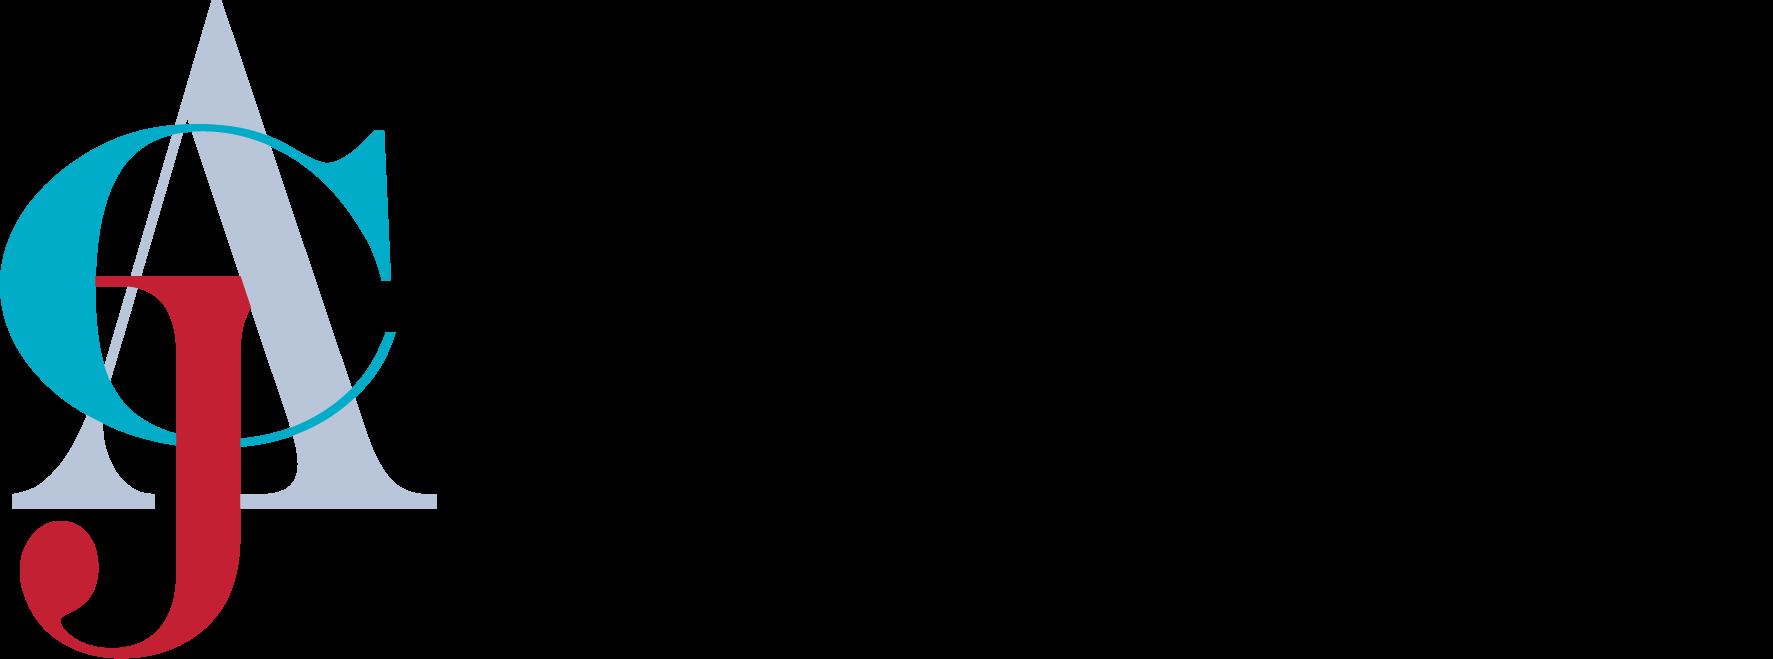 CJ & Associates sponsor logo